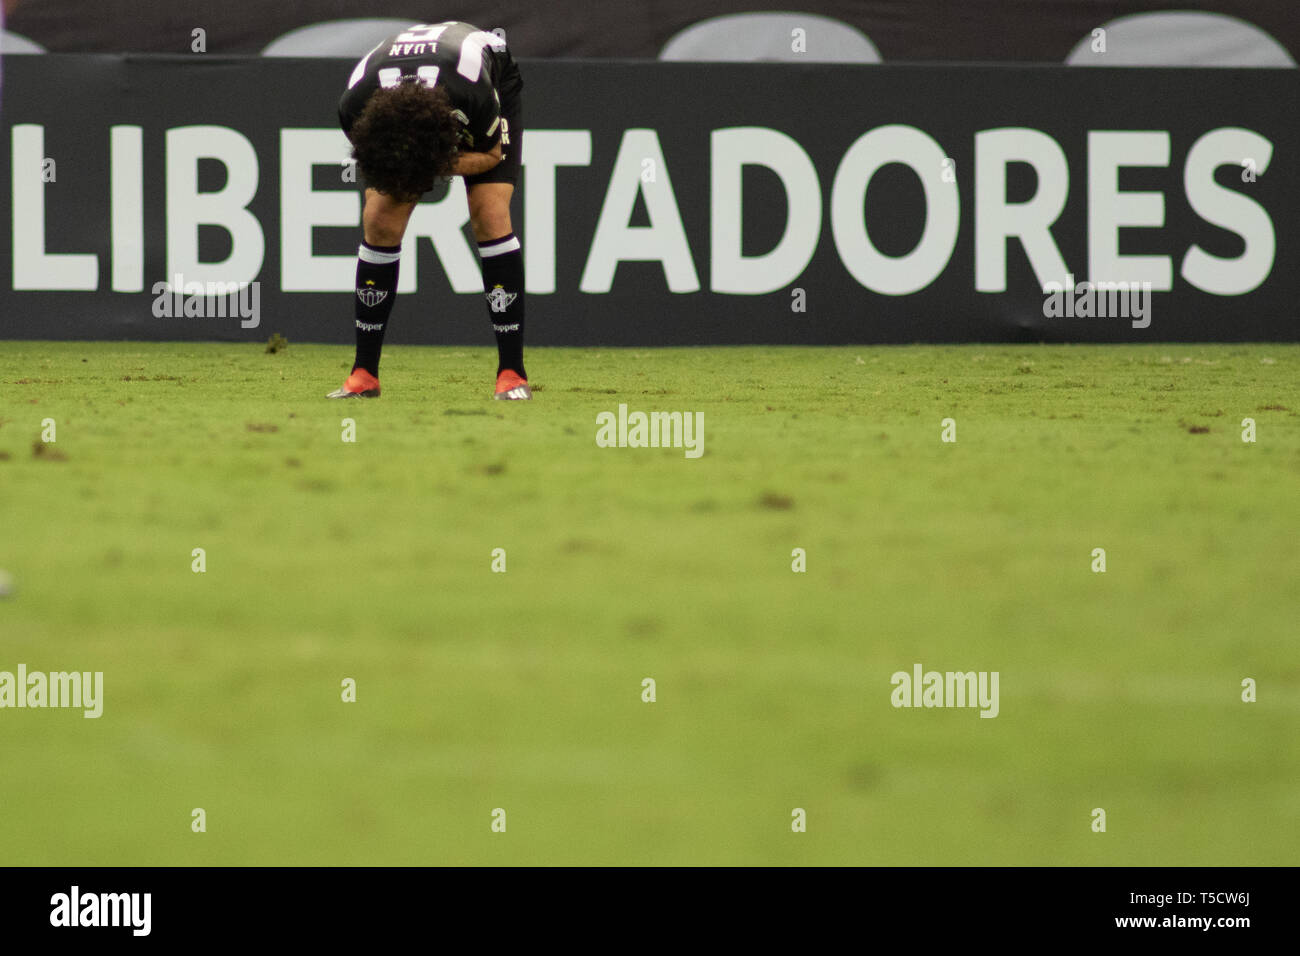 Atletico Nacional High Resolution Stock Photography And Images Alamy